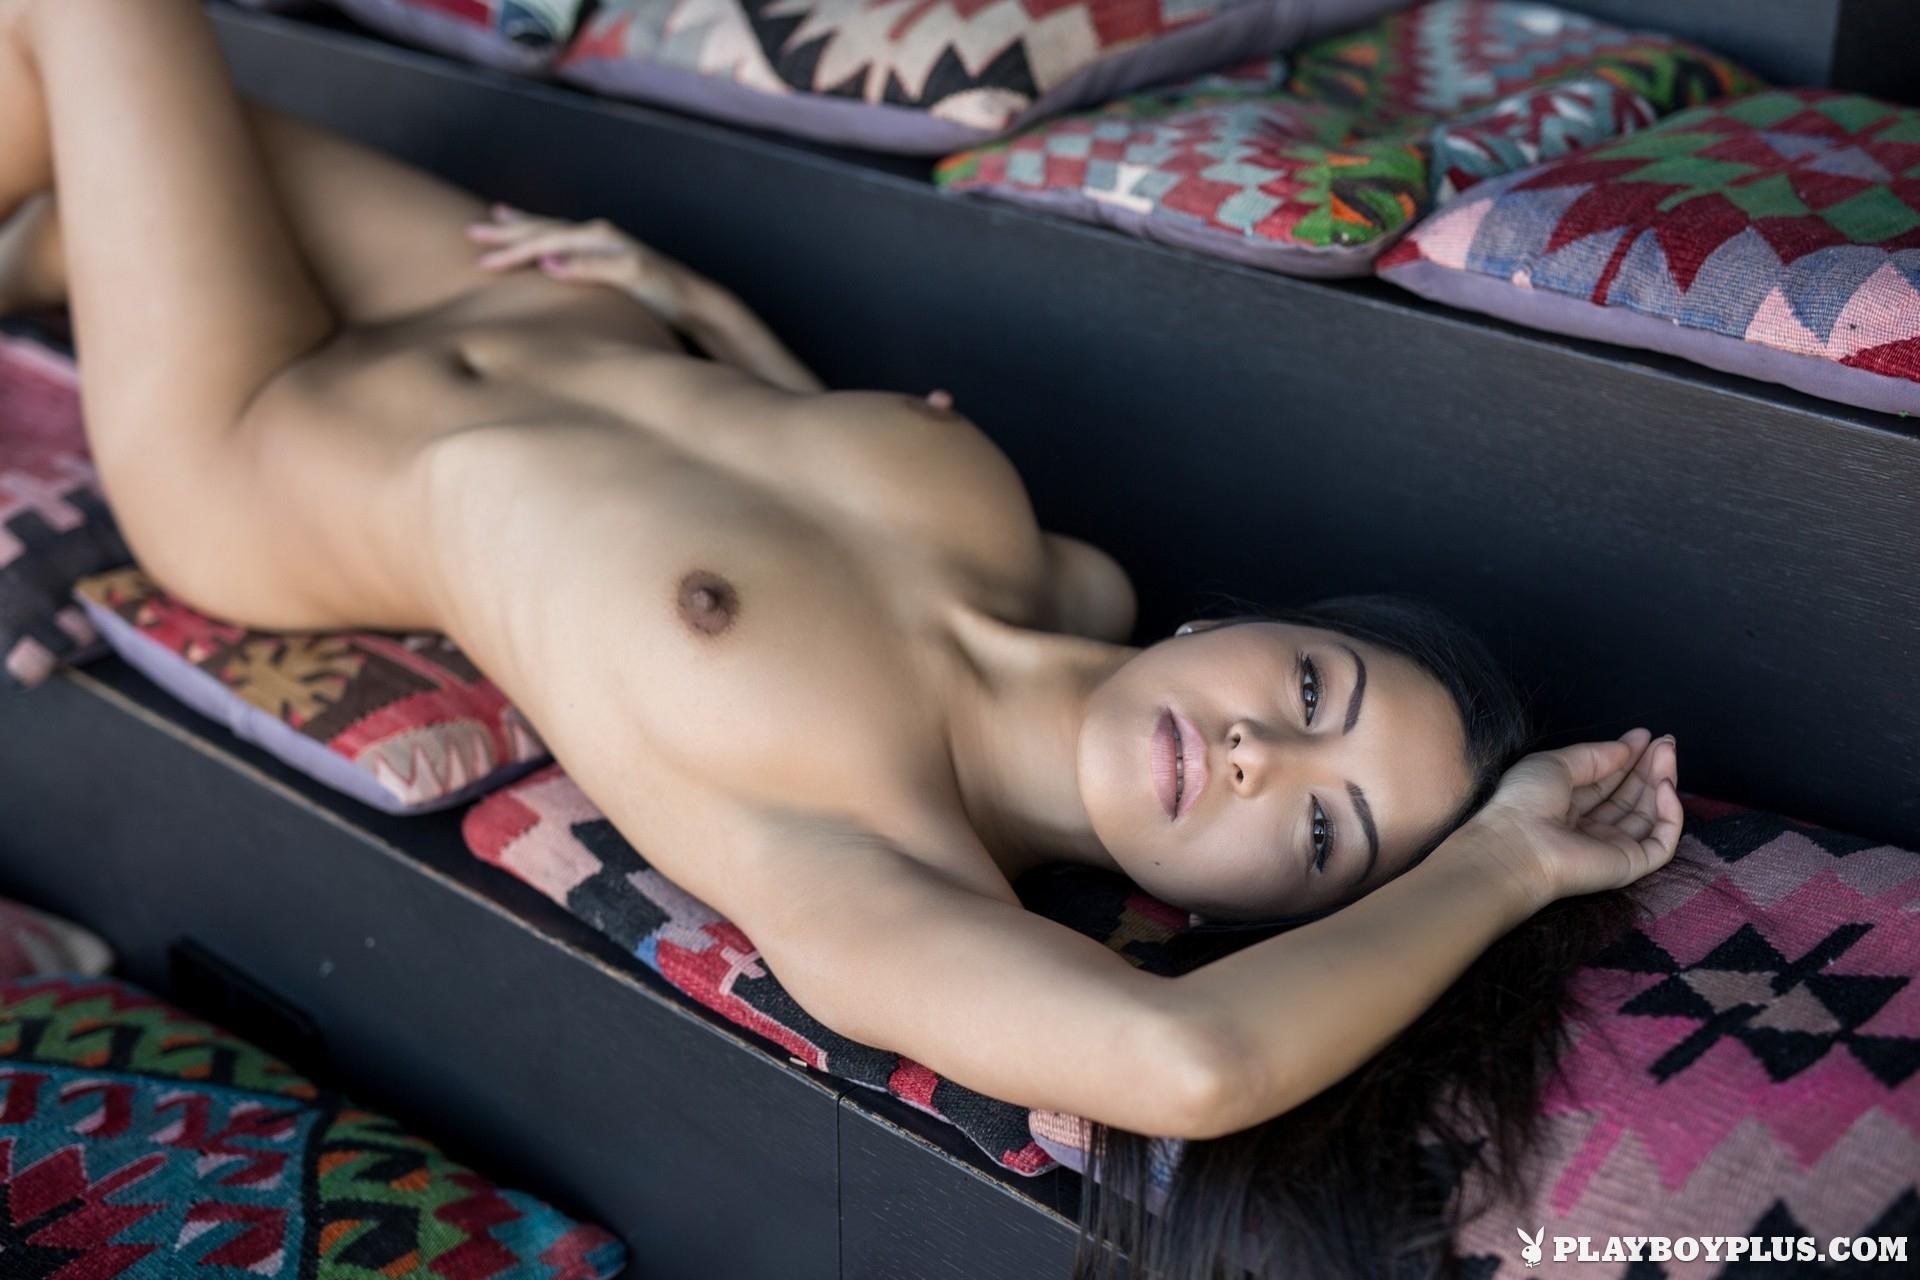 Playboy Plus Chloe Rose In Inspiring View (12)